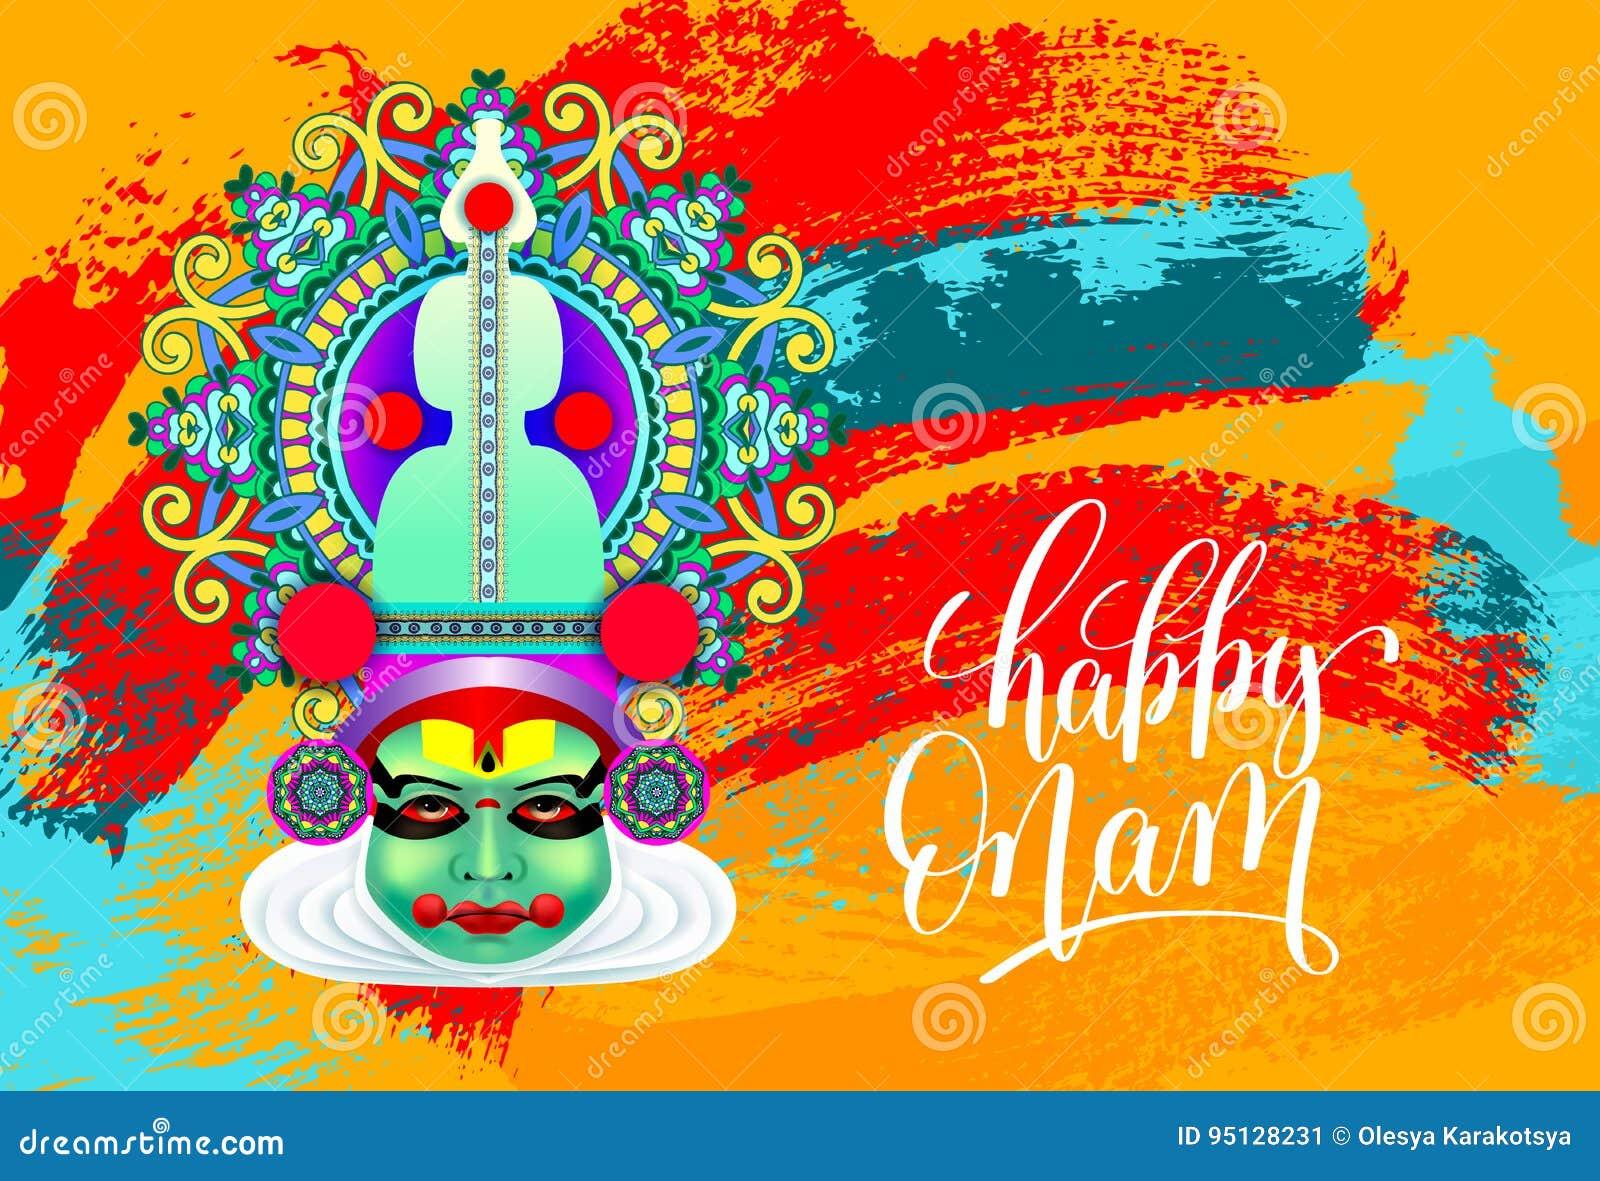 Happy onam greeting card with indian kathakali dancer face stock download happy onam greeting card with indian kathakali dancer face stock vector illustration of kerala m4hsunfo